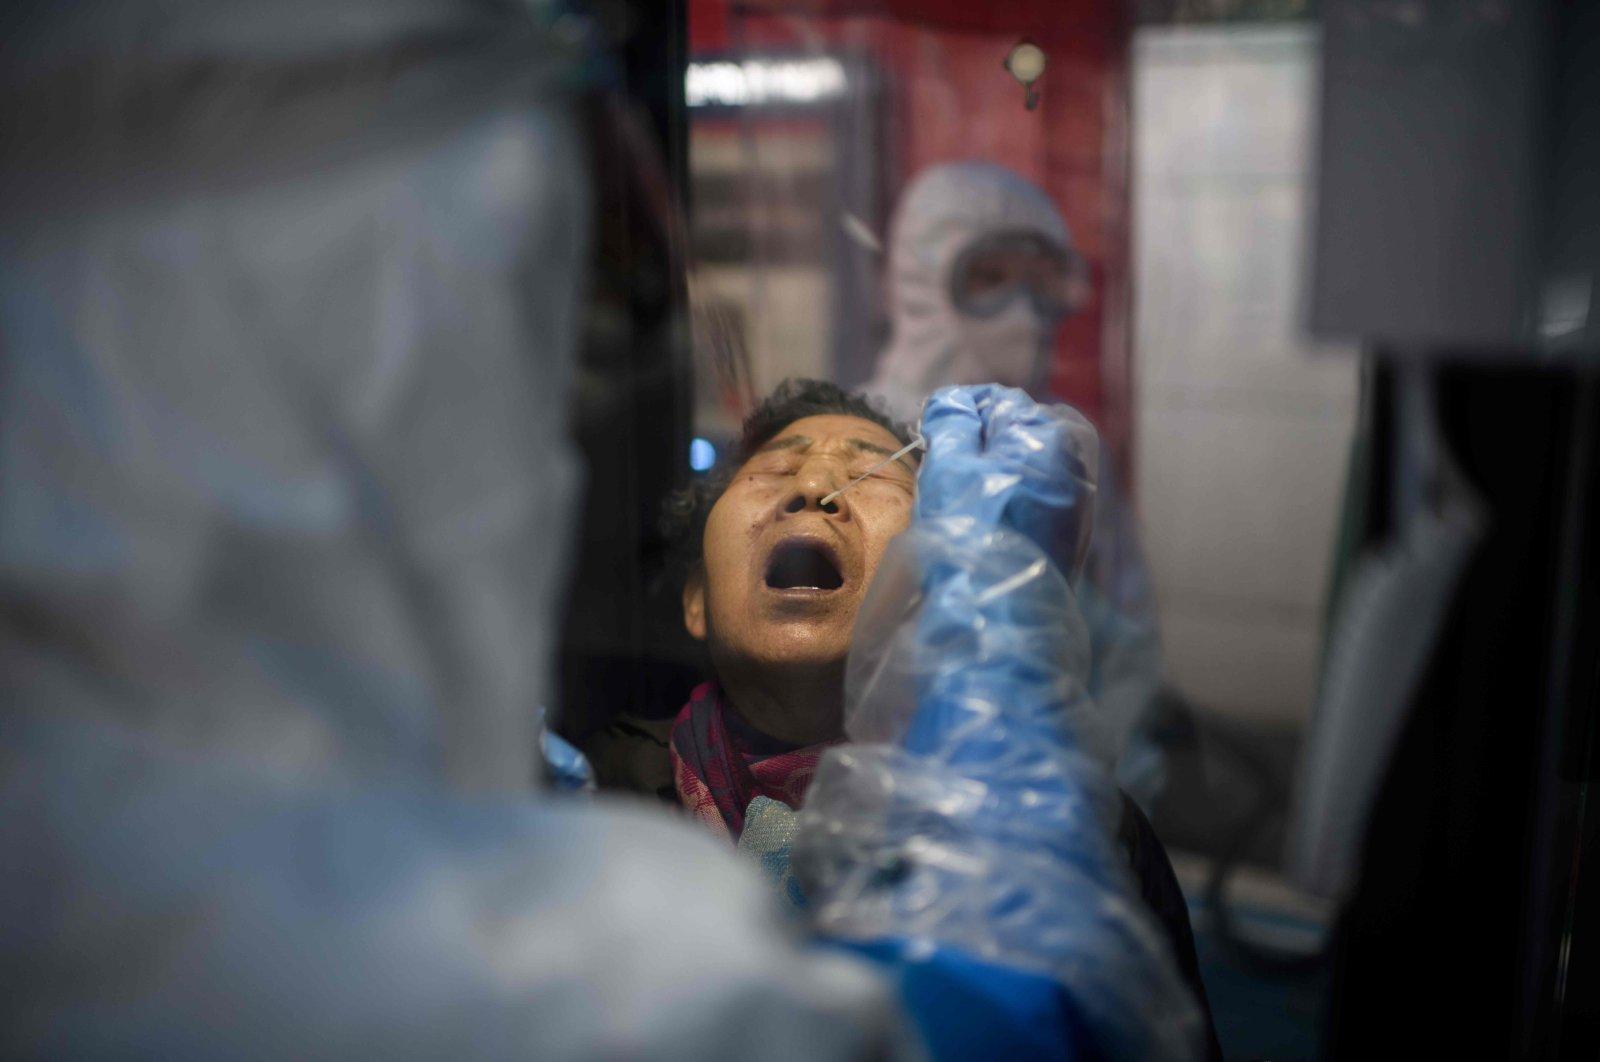 A woman receives a COVID-19 novel coronavirus test swab at a testing booth outside the Yangji hospital in Seoul, South Korea, March 17, 2020. (AFP Photo)